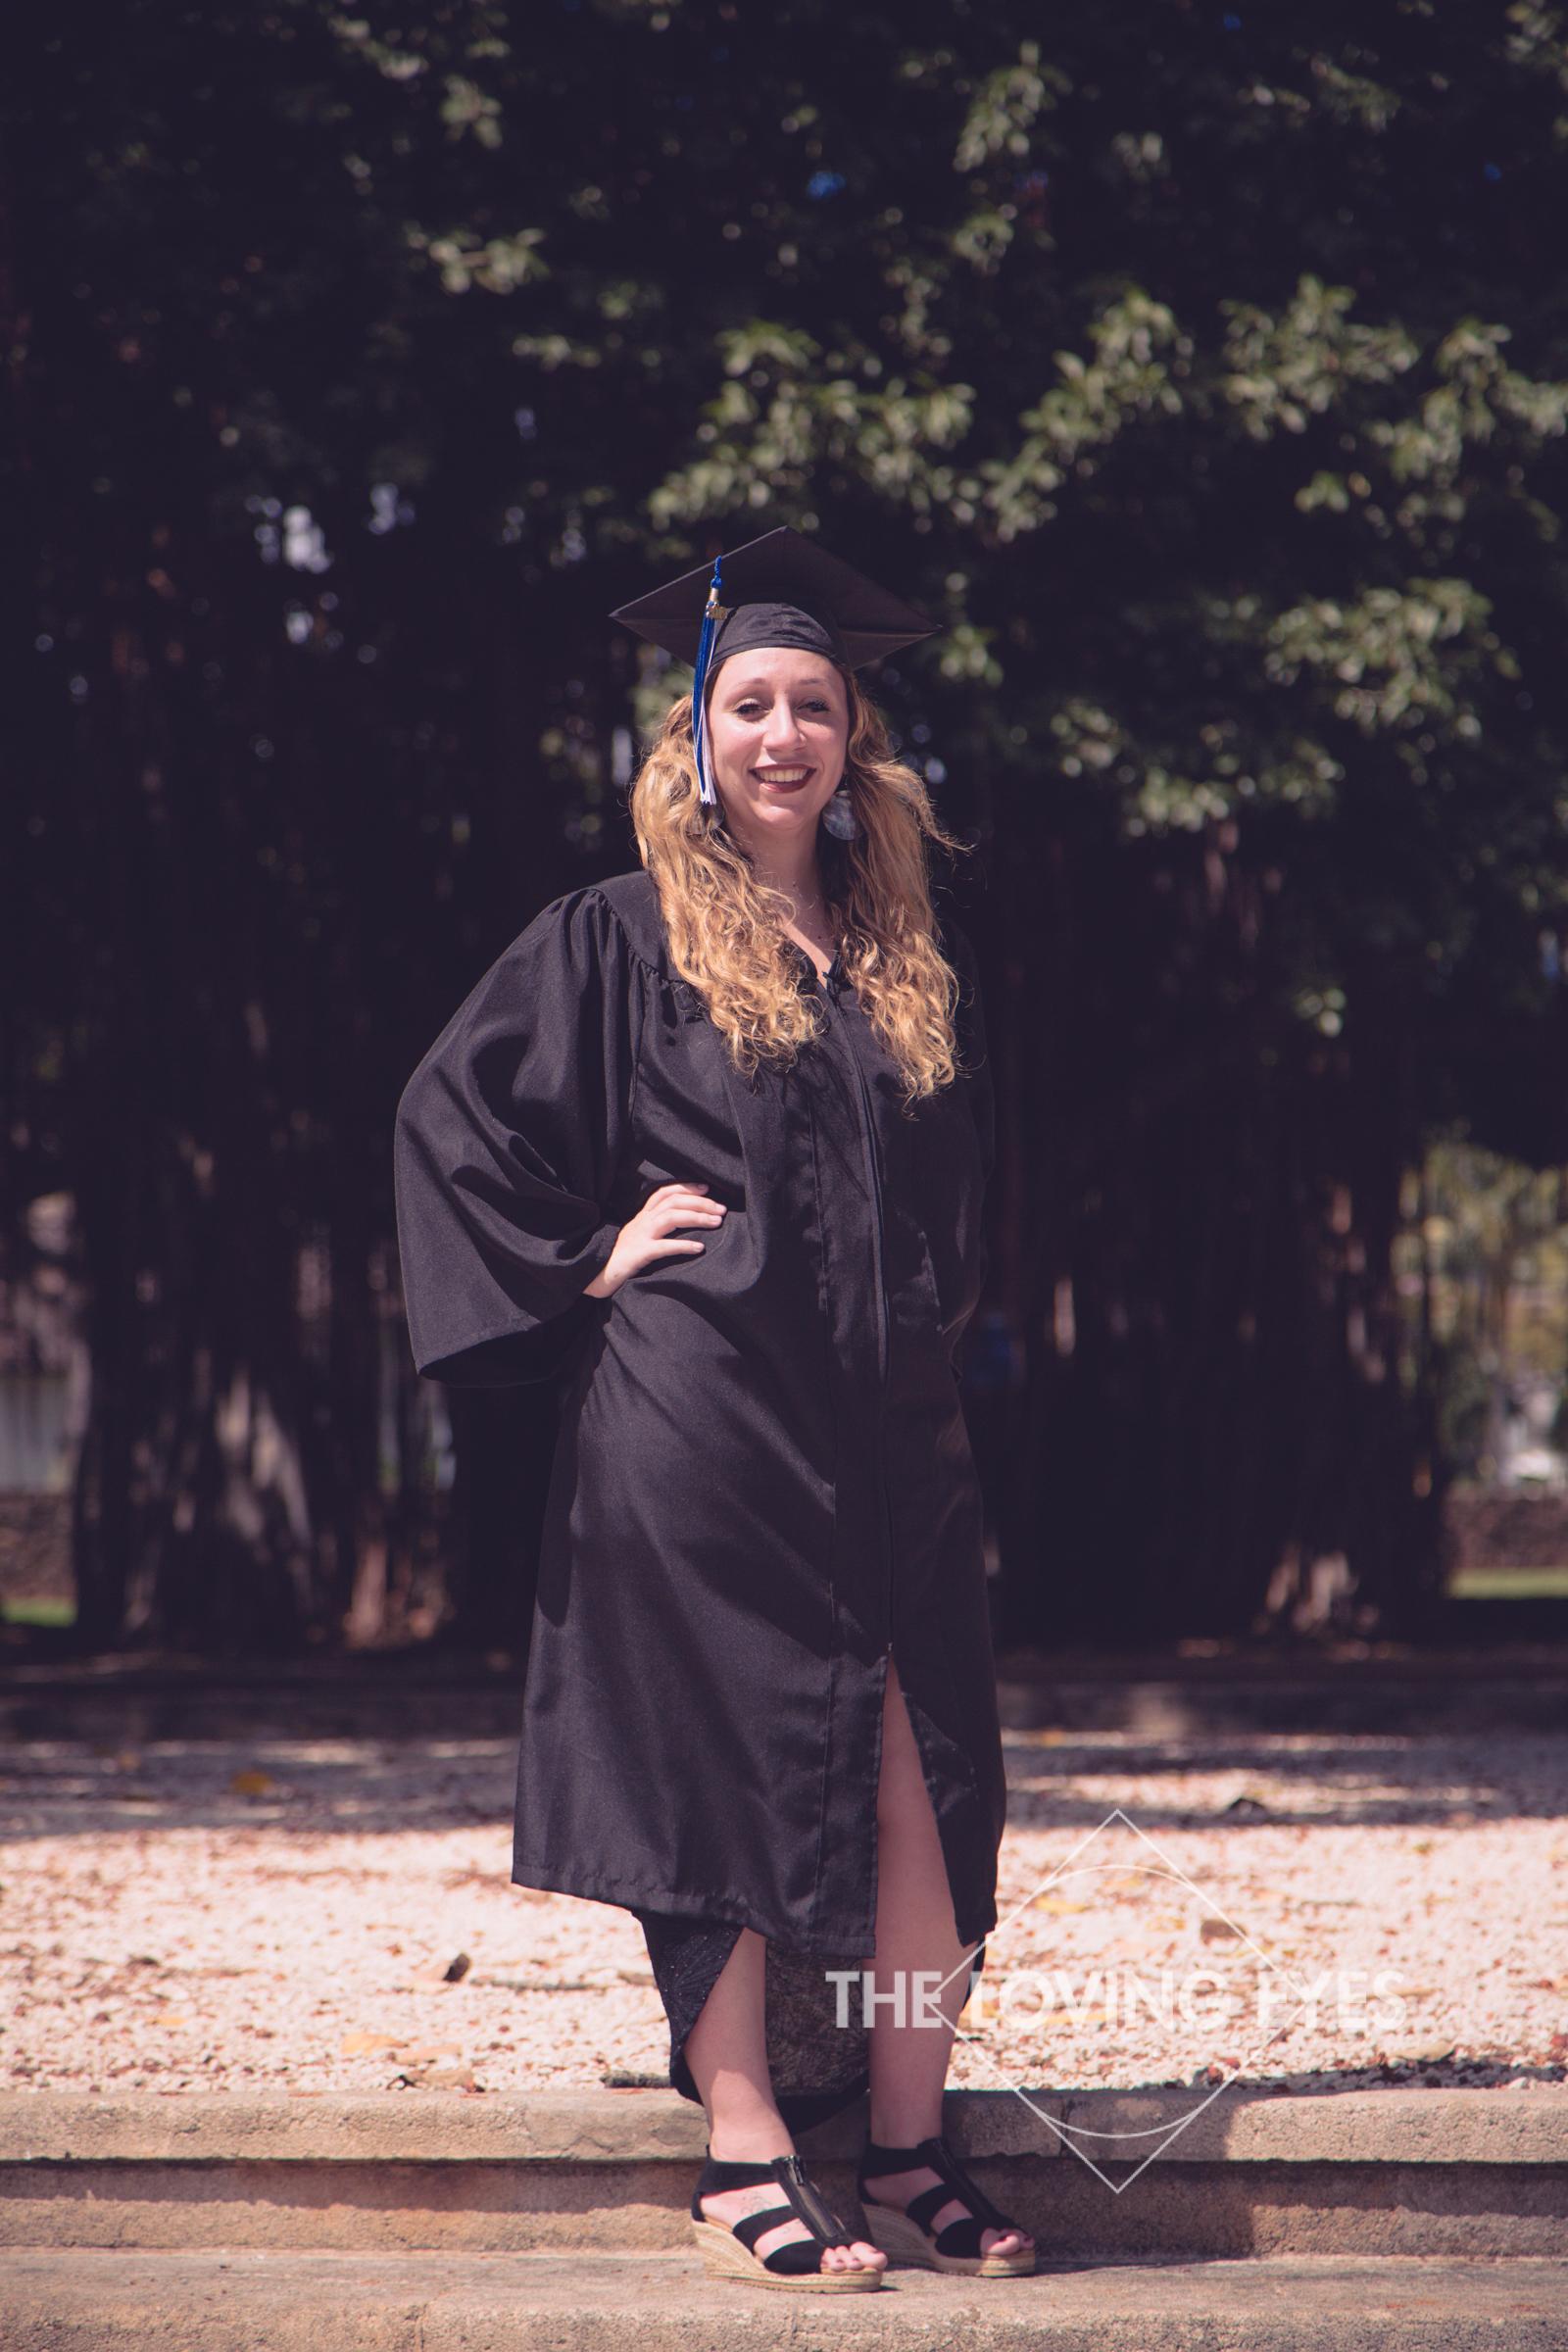 Chaminade graduation portrait-2.jpg